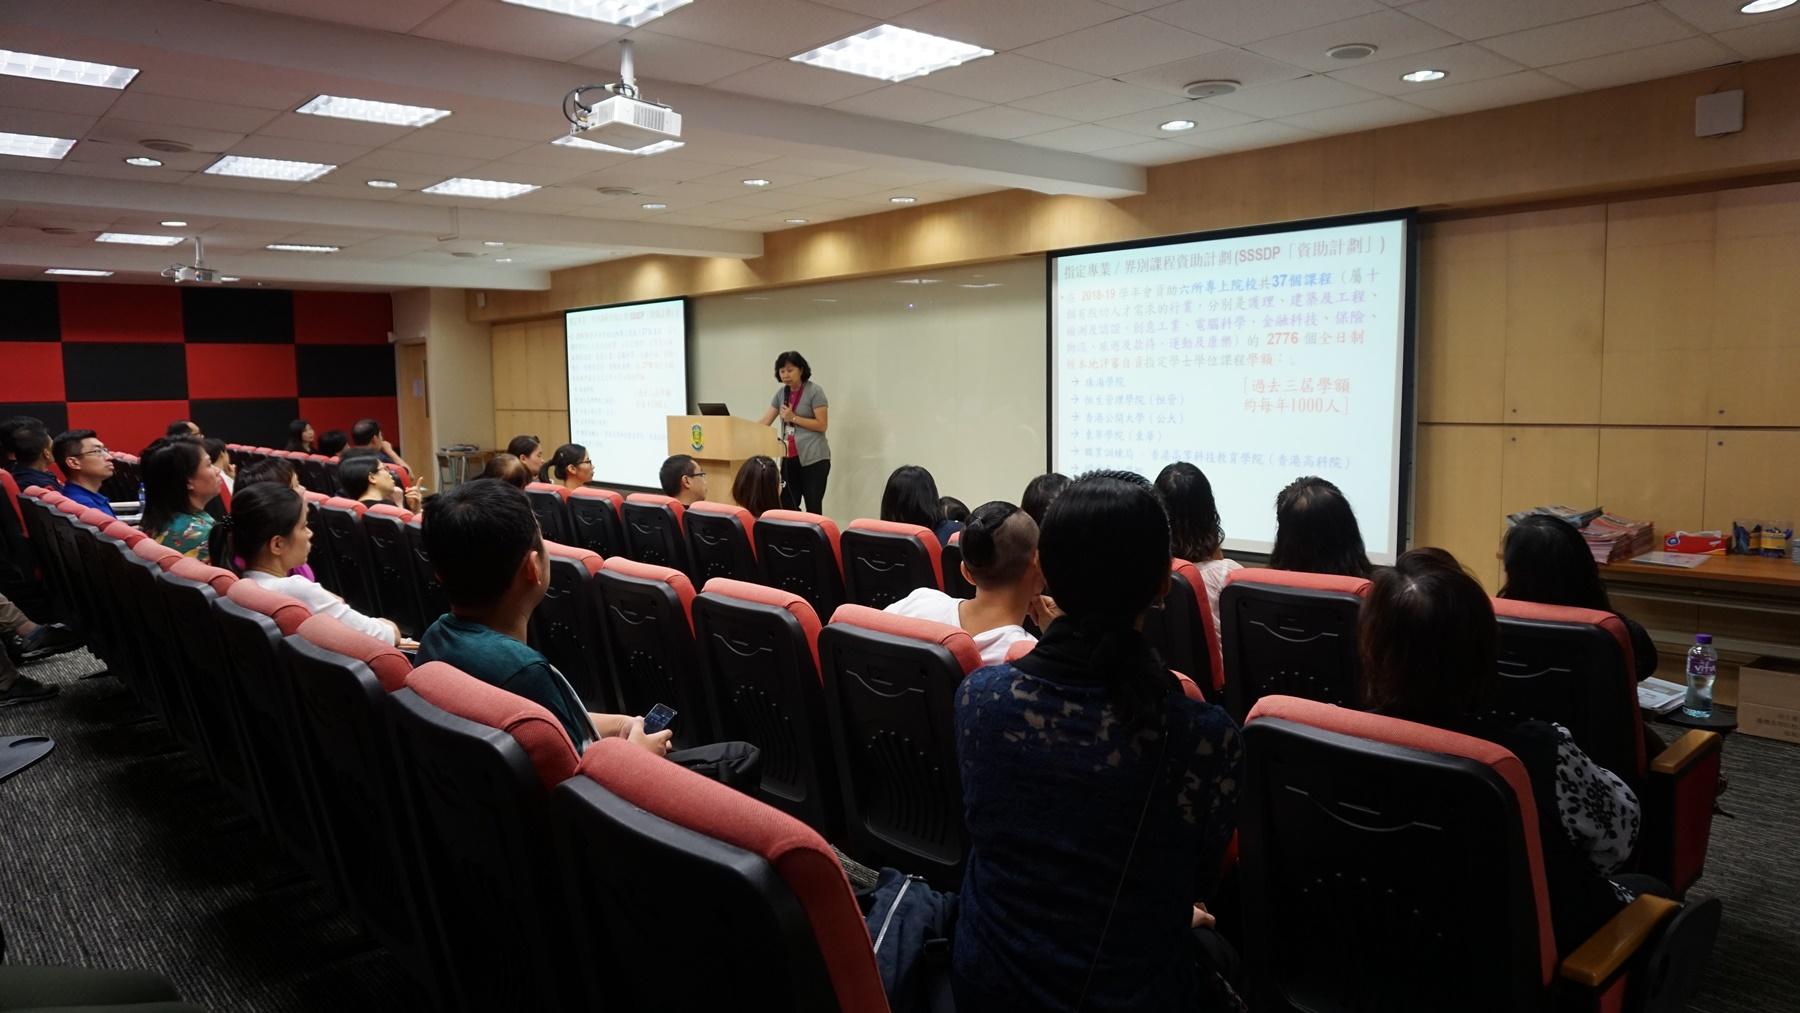 http://www.npc.edu.hk/sites/default/files/dsc02947.jpg